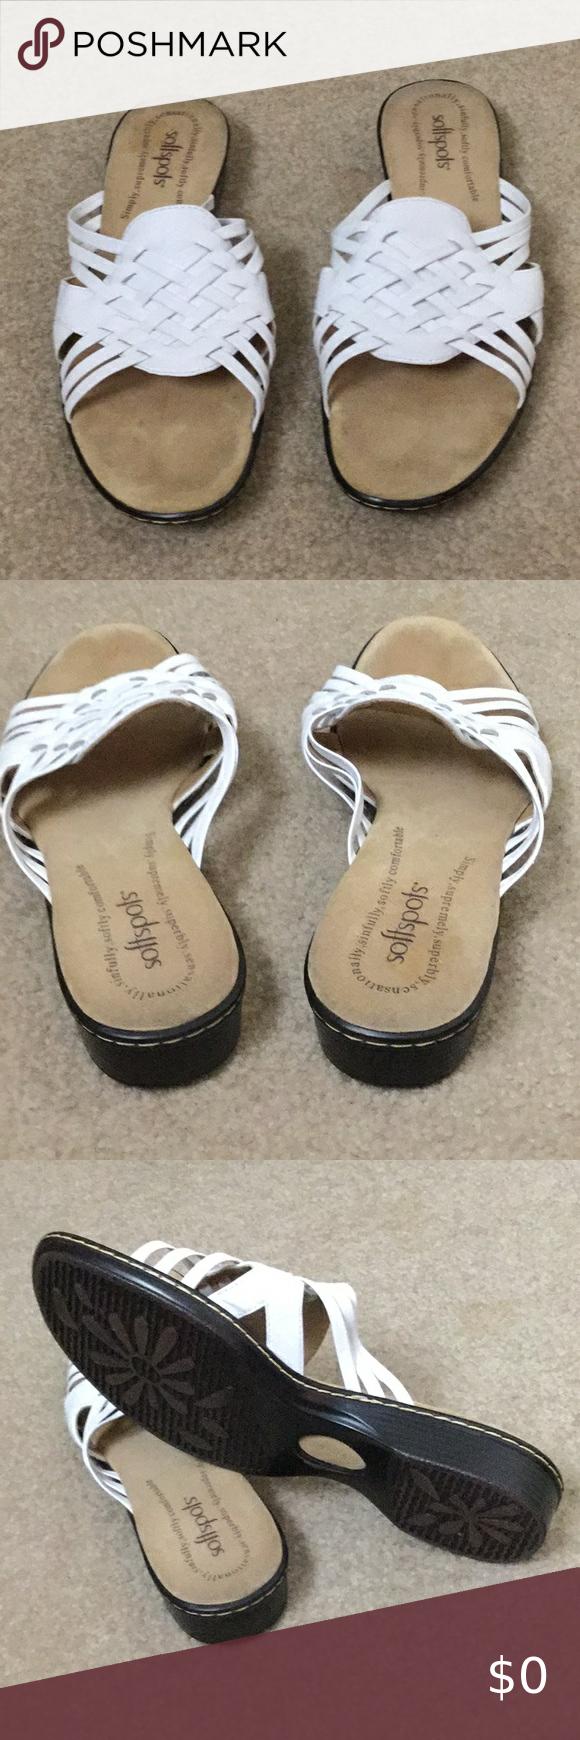 Soft Spots women's white sandals. 8.5